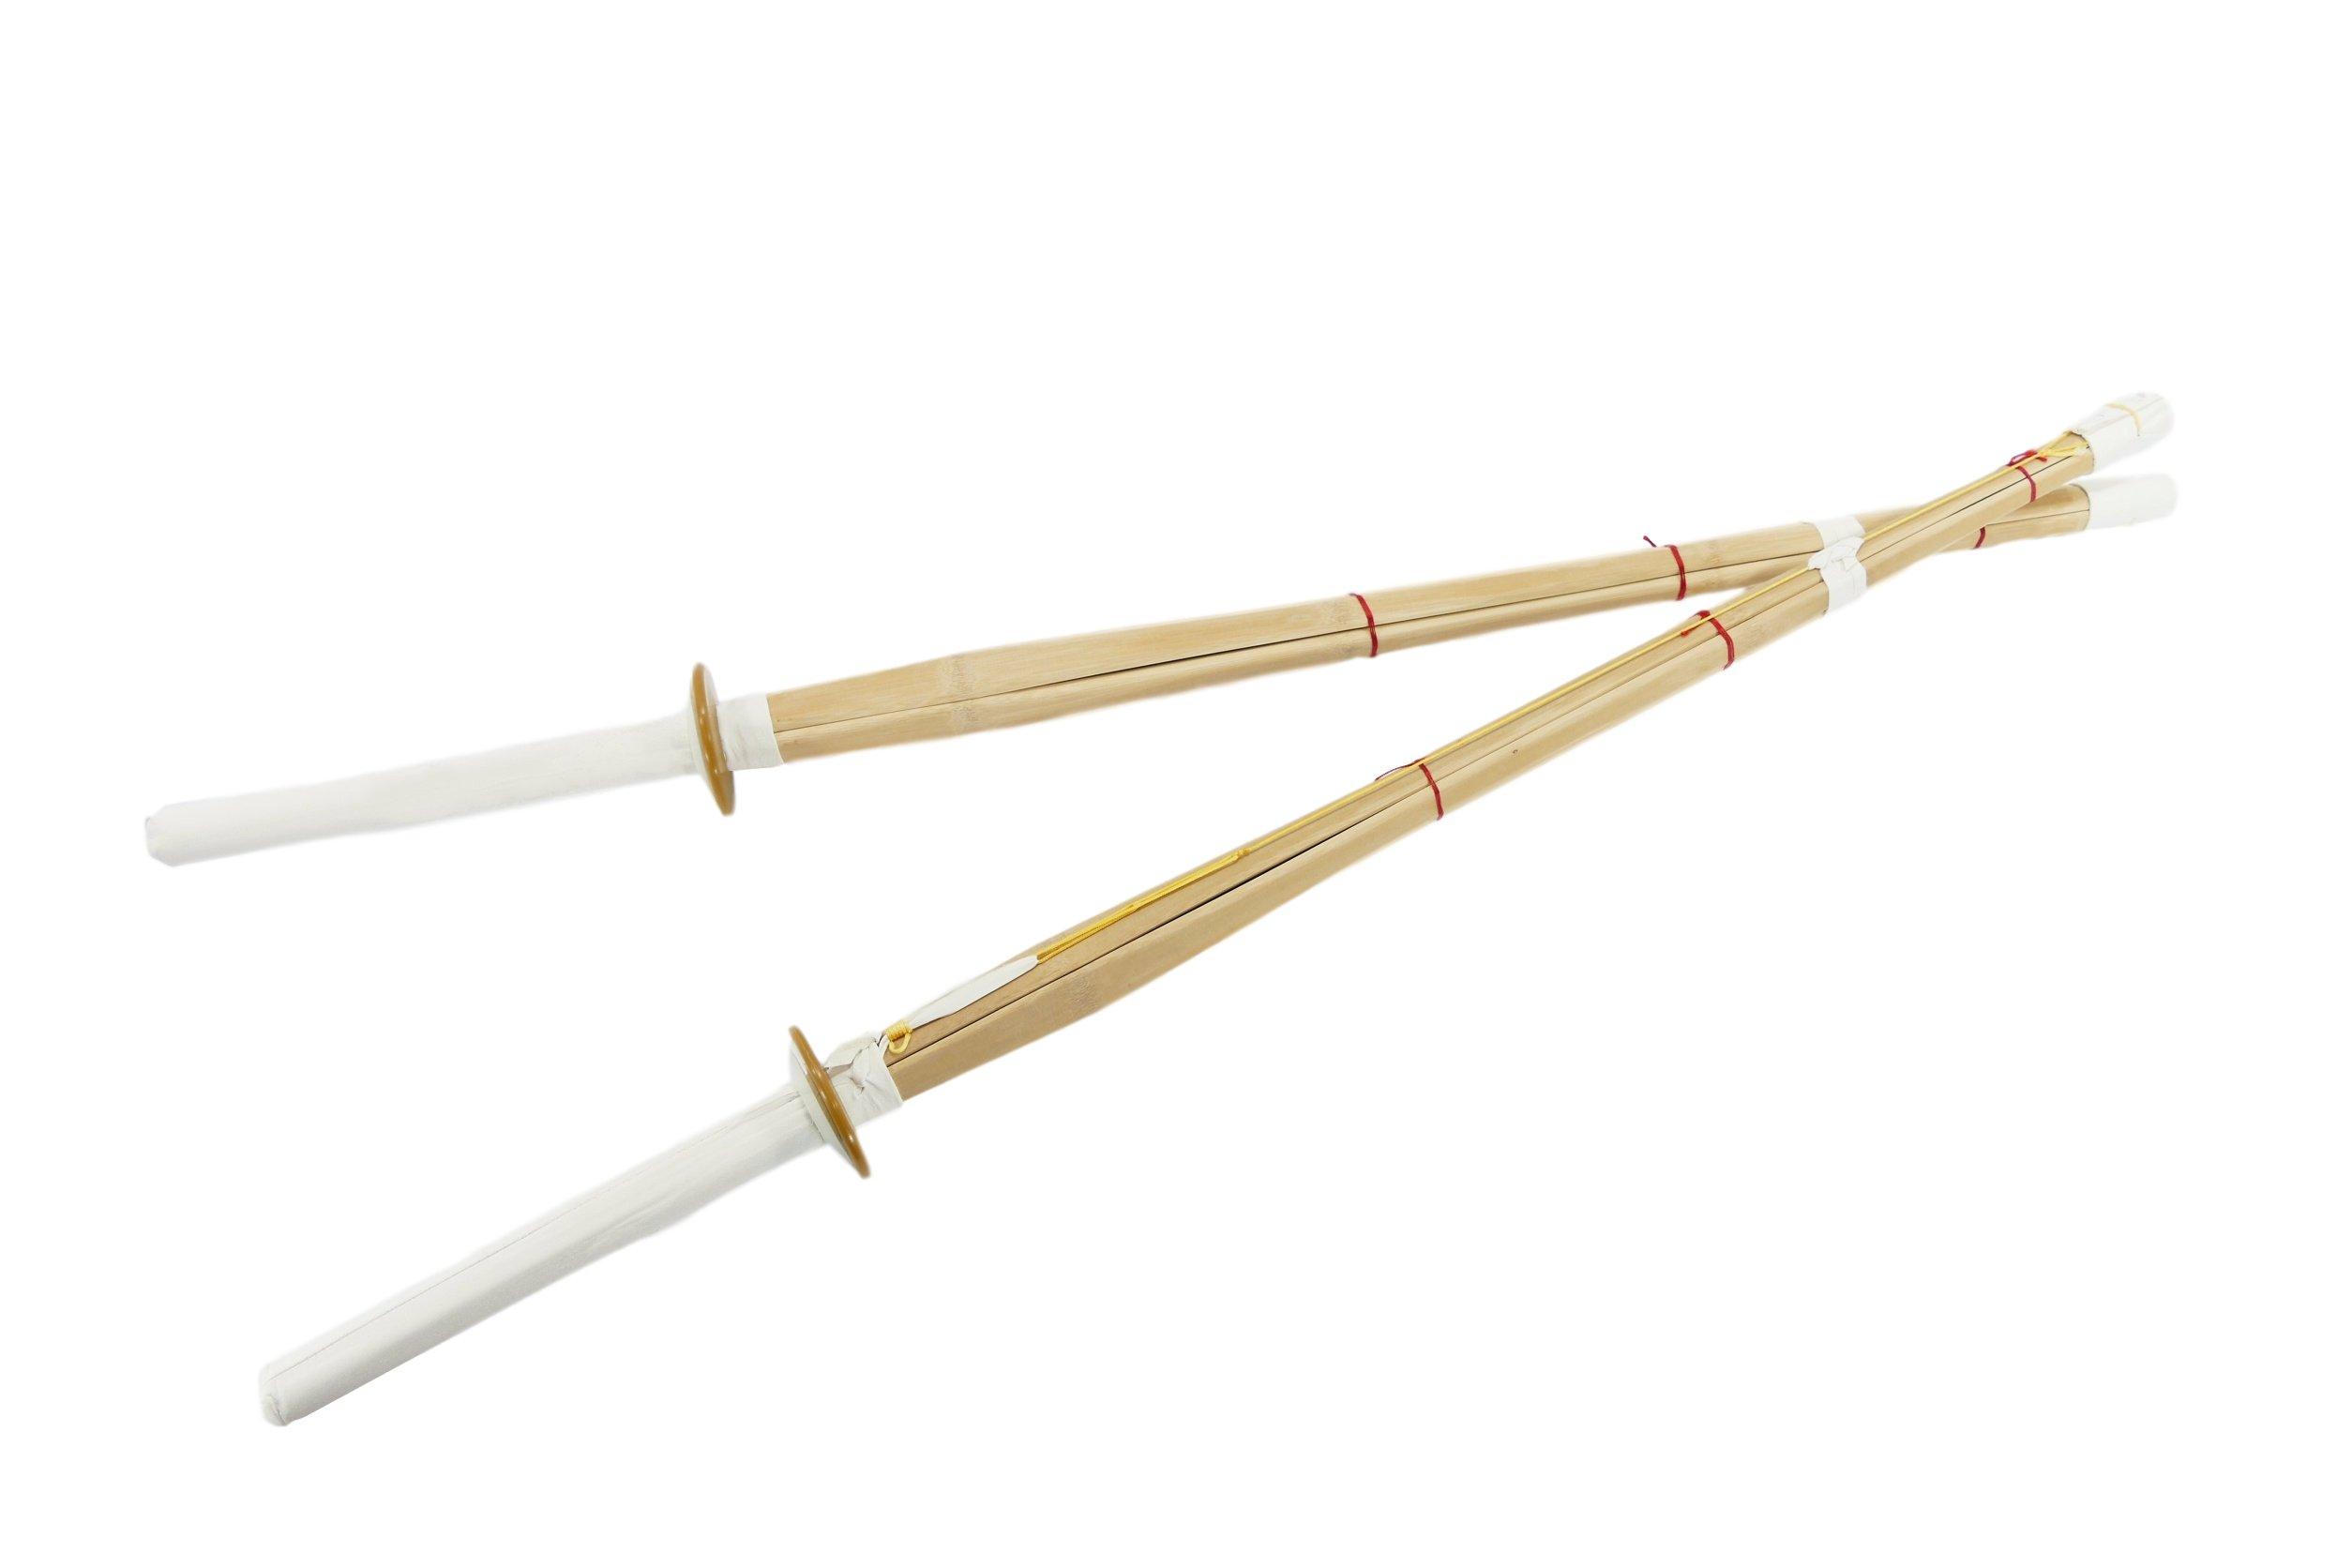 MAKOTO 42'' Shinai Bamboo Swords for Kendo Practice - Pair of 2 by MAKOTO